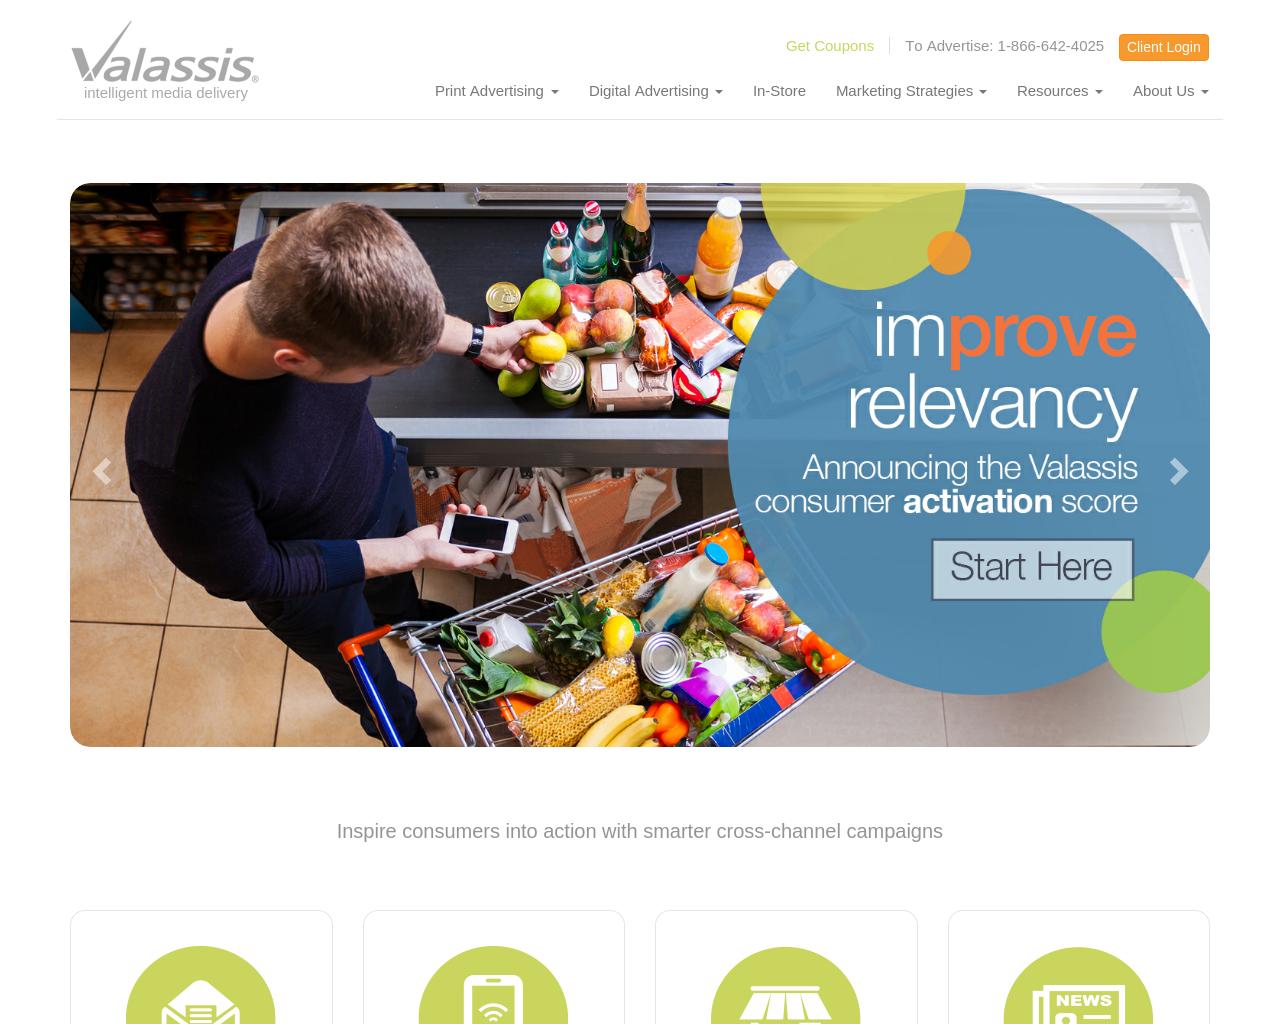 Valassis-Interactive-Advertising-Reviews-Pricing